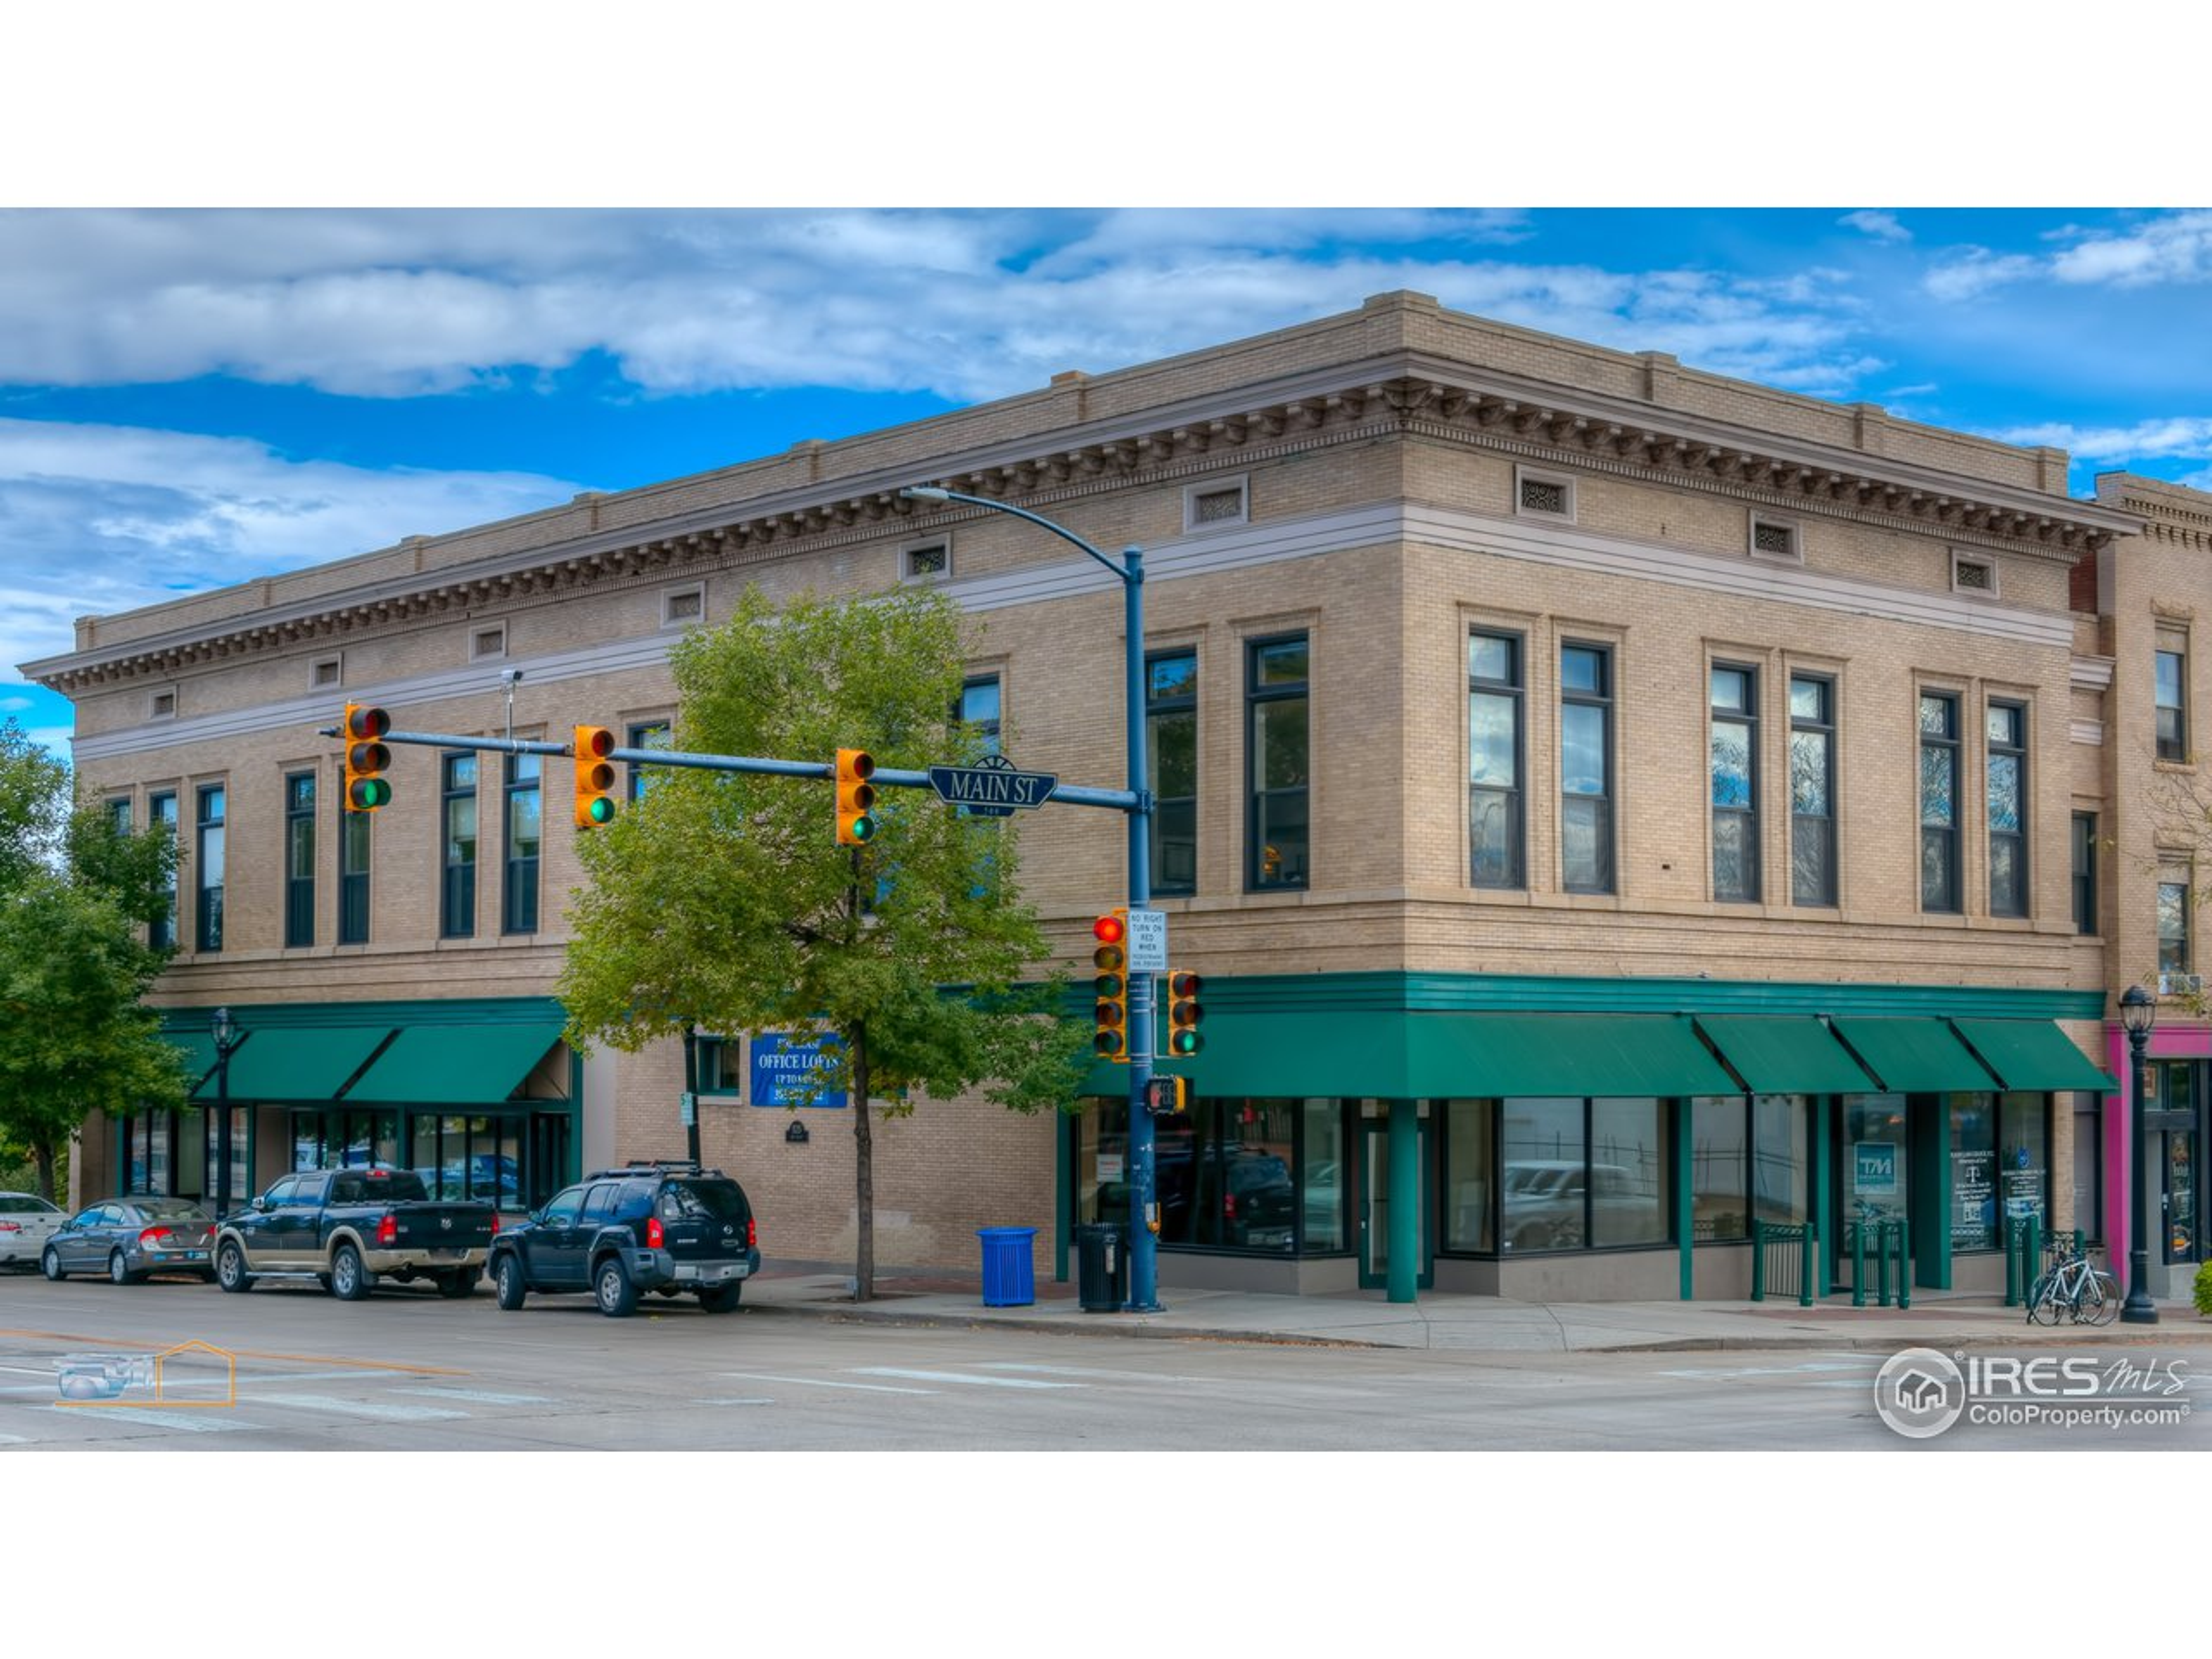 525 3rd Ave, Longmont CO 80501 - Photo 1